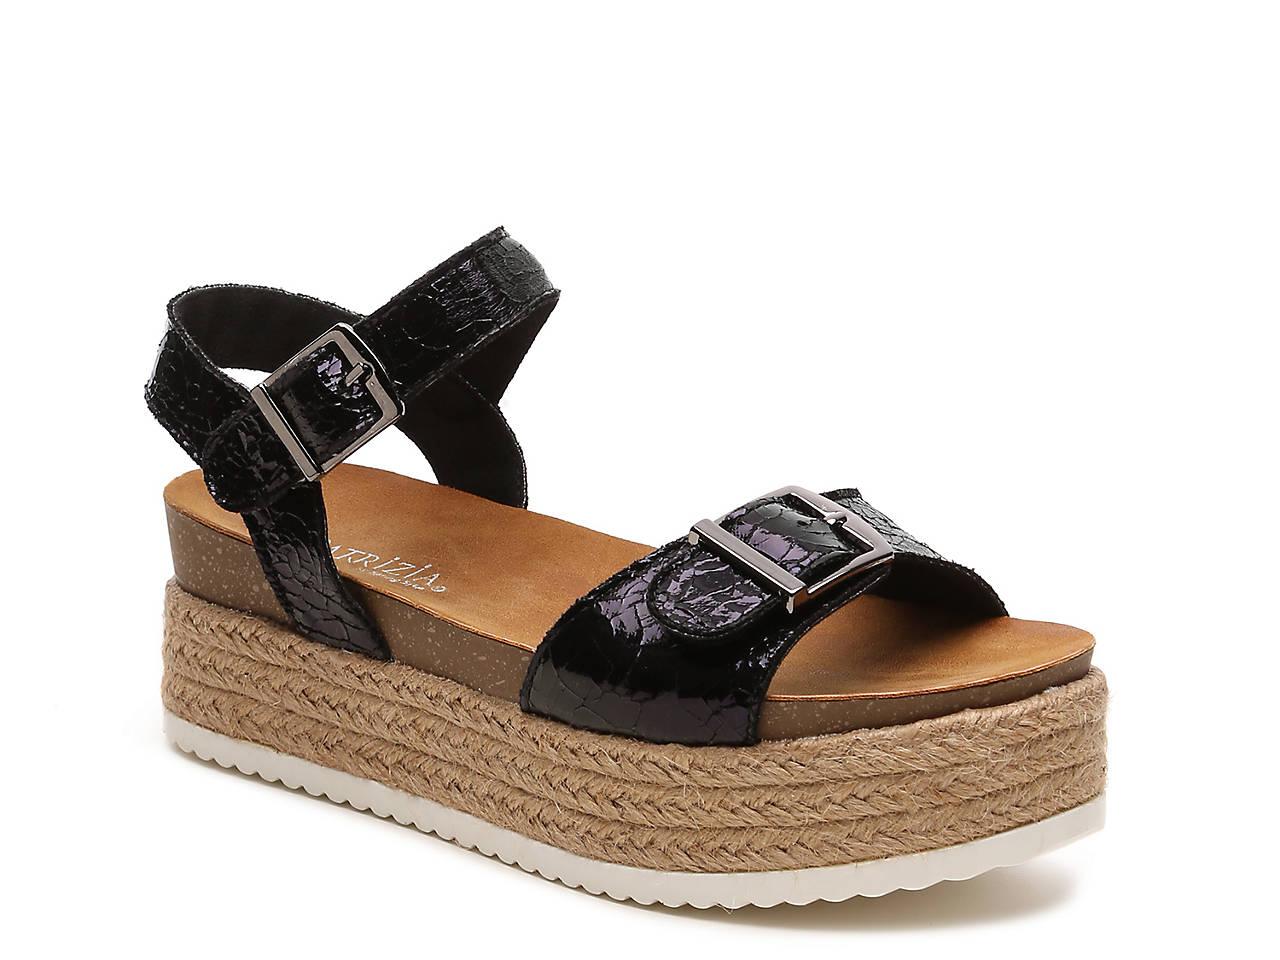 2e496705220 Ciri Espadrille Platform Sandal